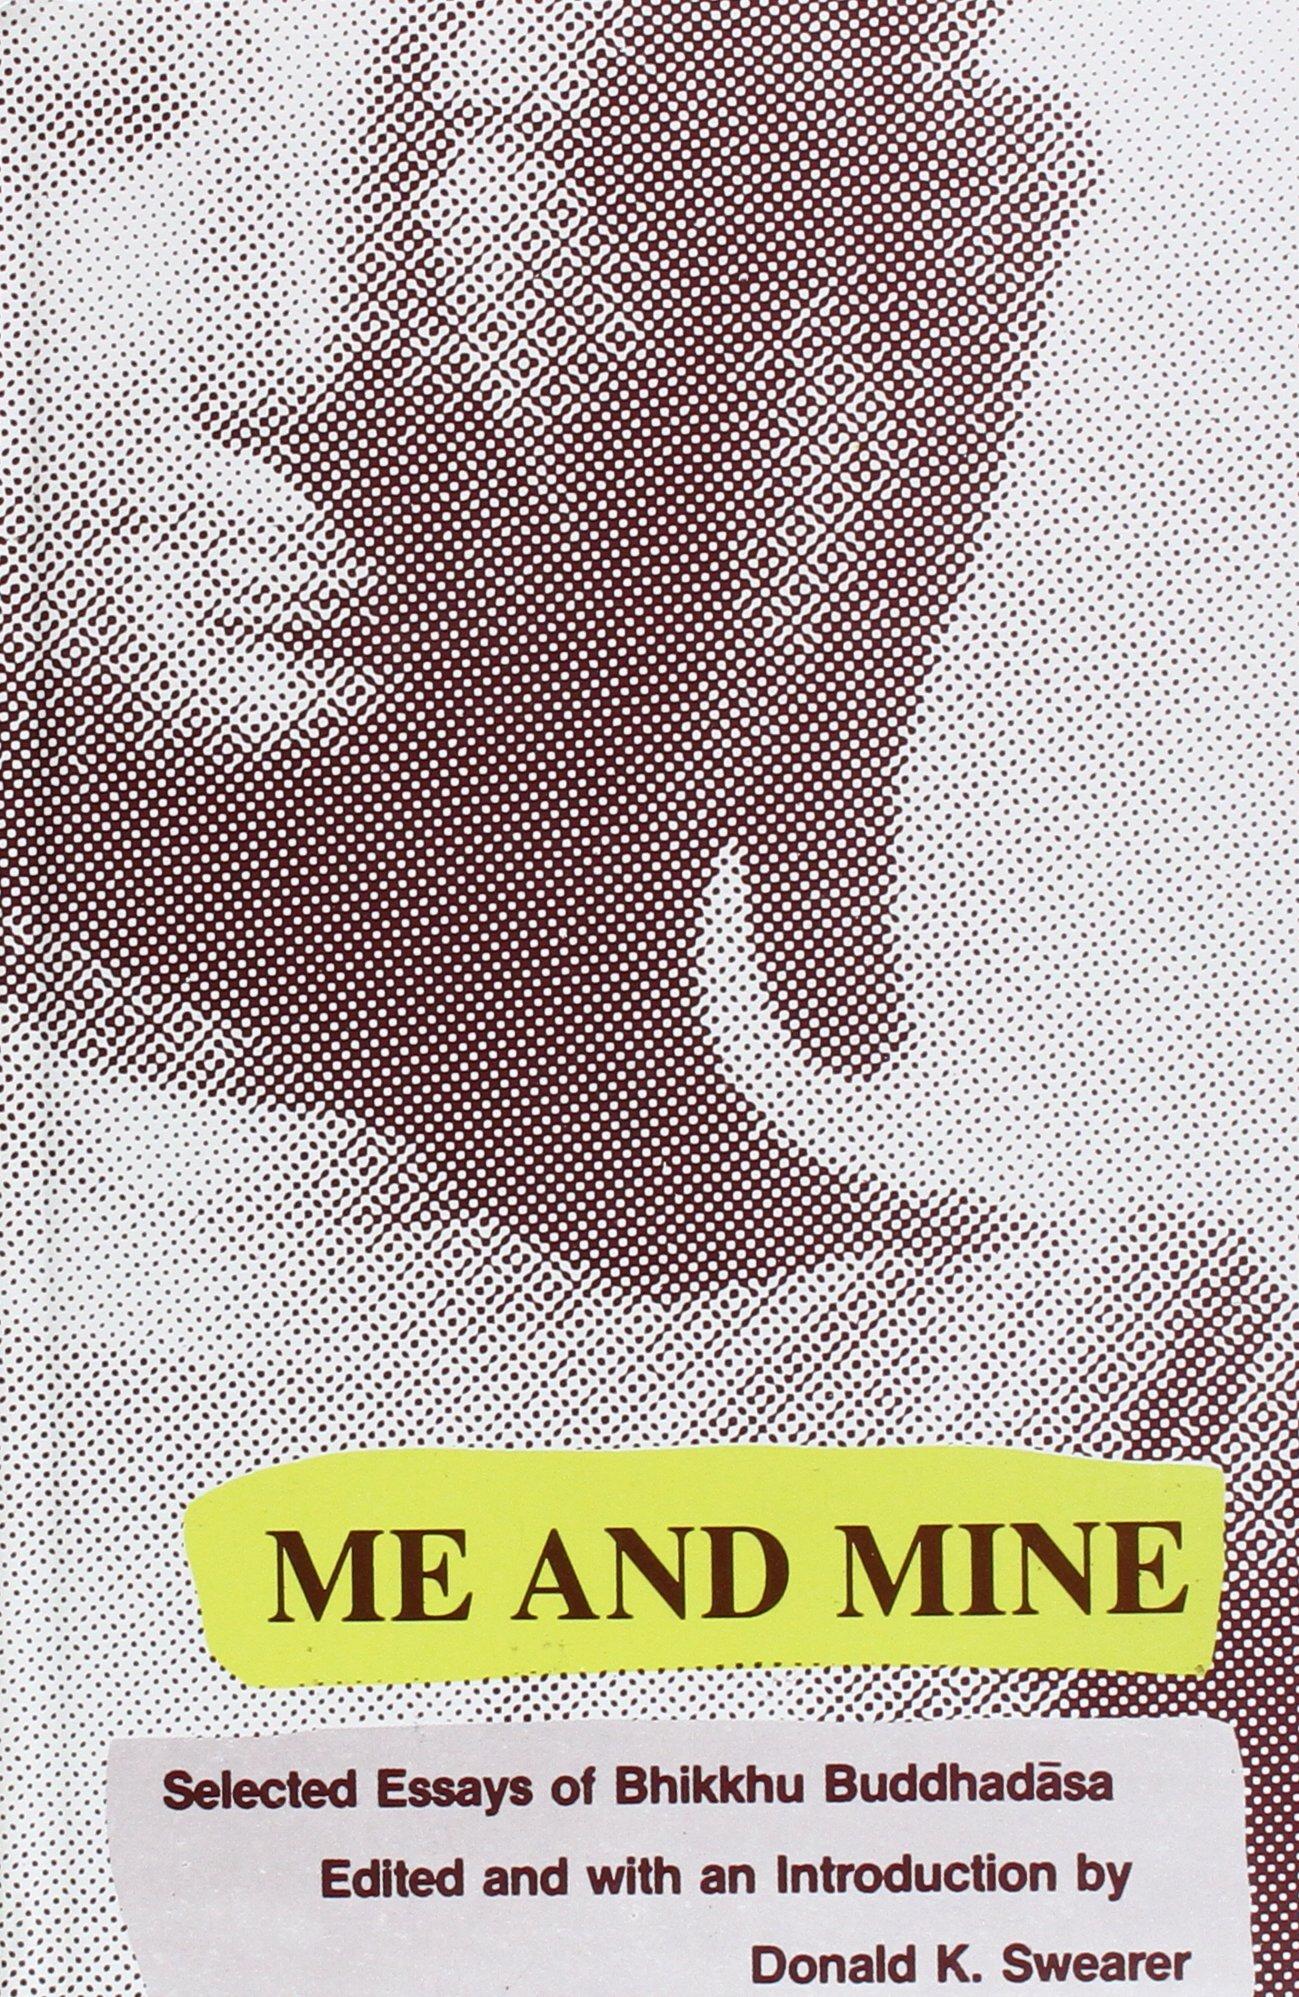 Buddhadasa Me and Mine cover art